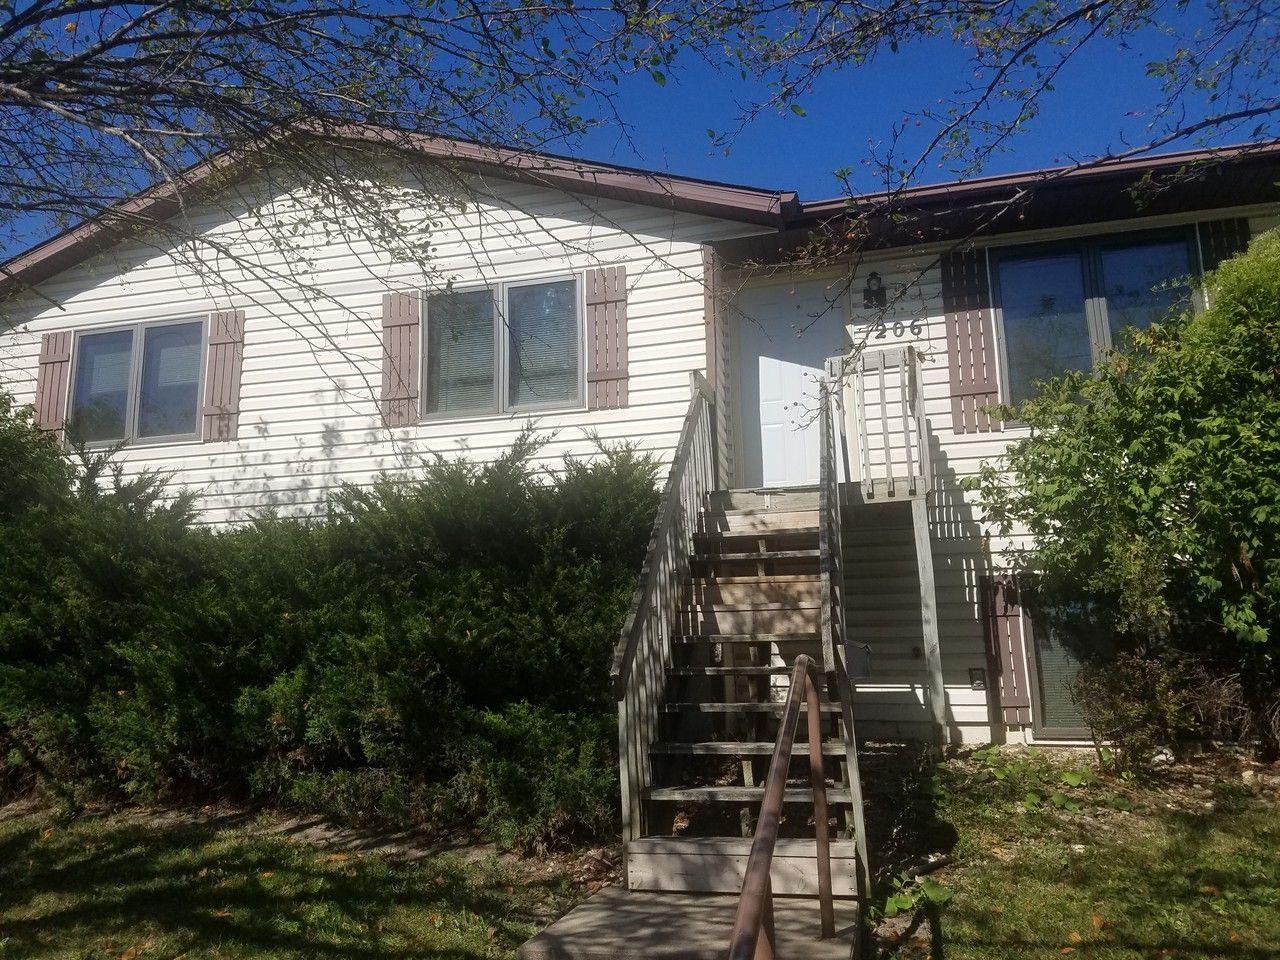 206 West Benton Street, Iowa City, IA 52246 4 Bedroom ...